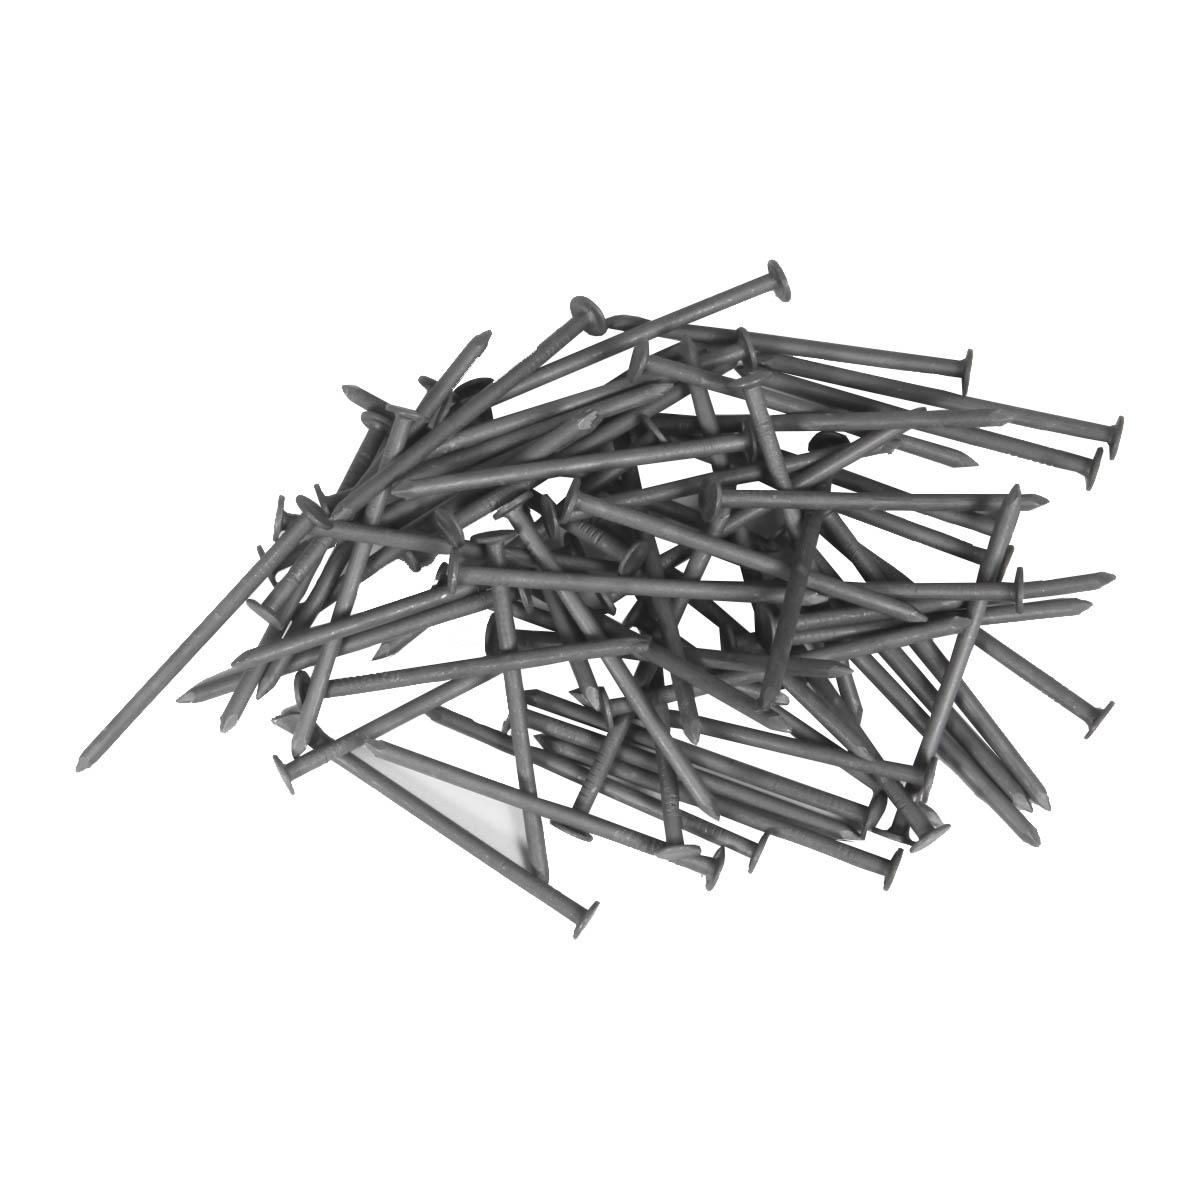 Phosphate Coated Nails - 3-1/2-in